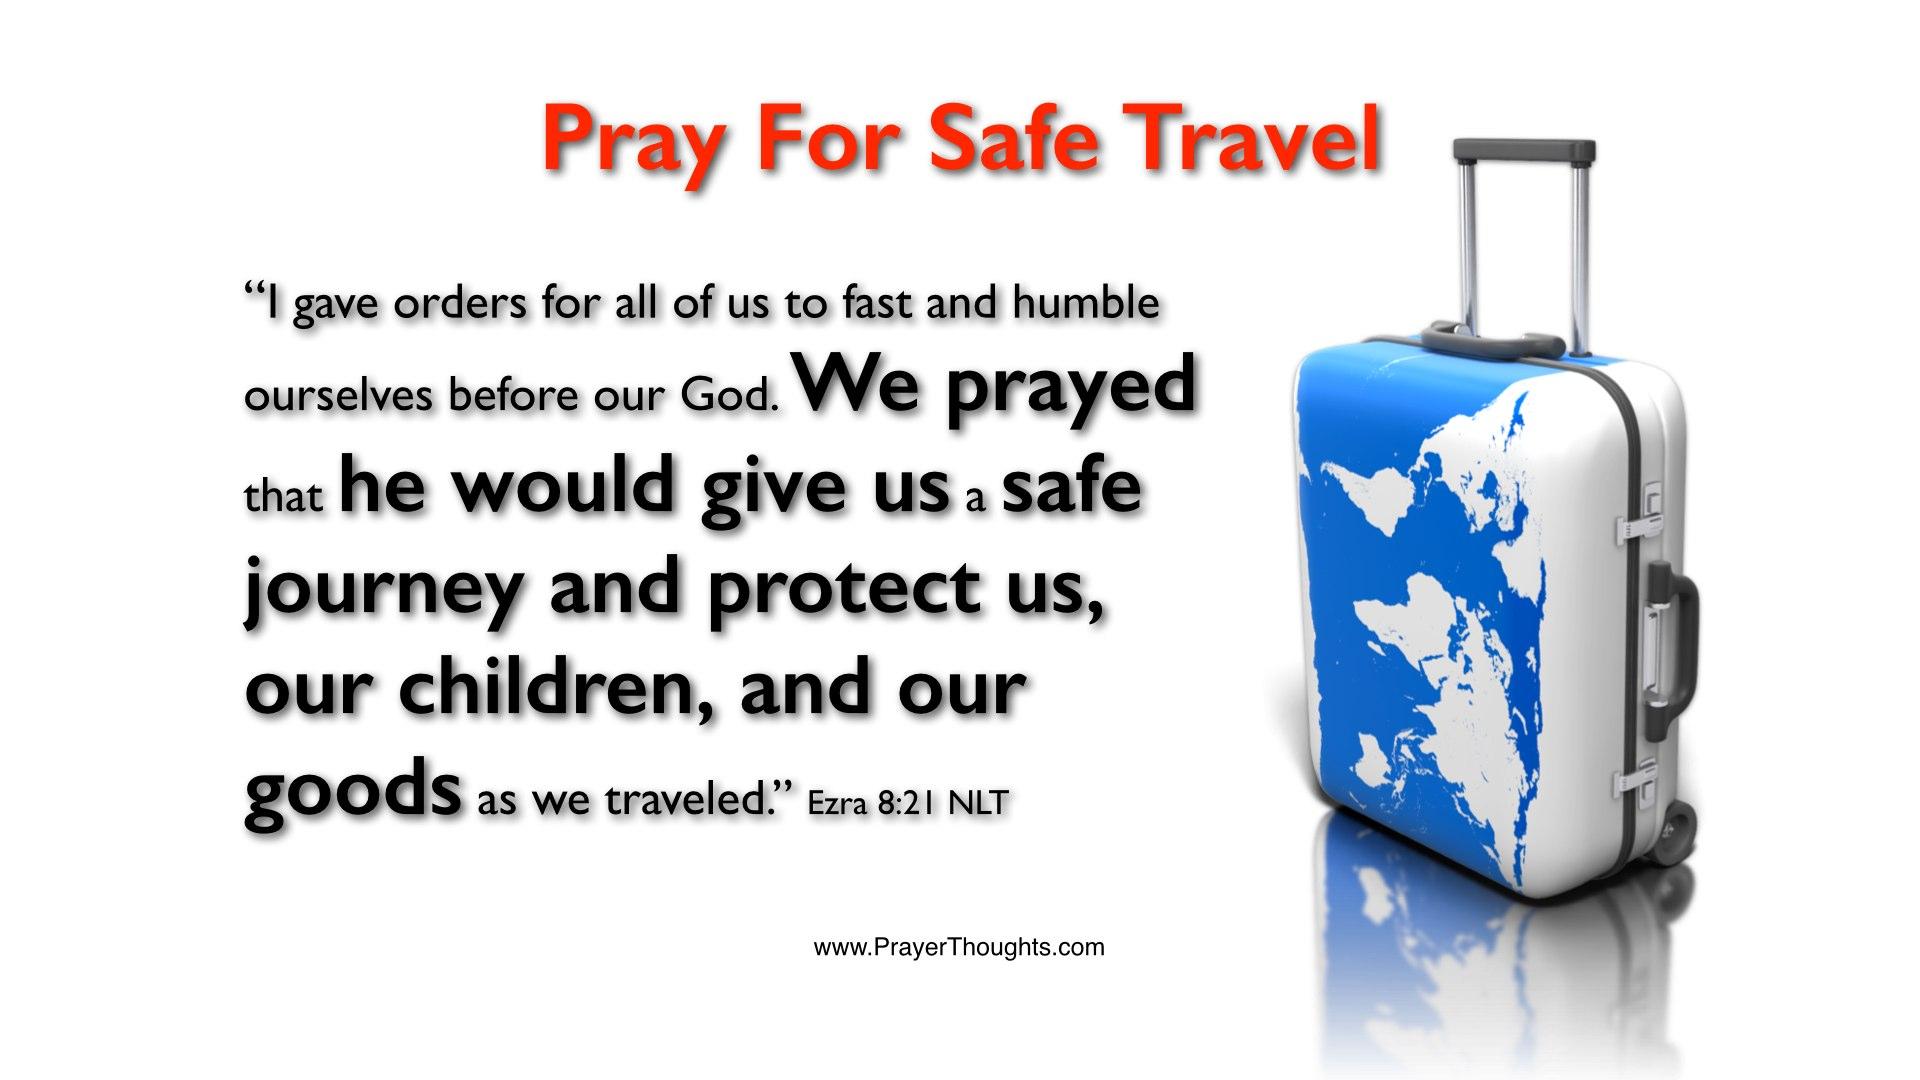 Pray Quotes | 1626112844 Ezra 8 21 PrayForSafeTravel